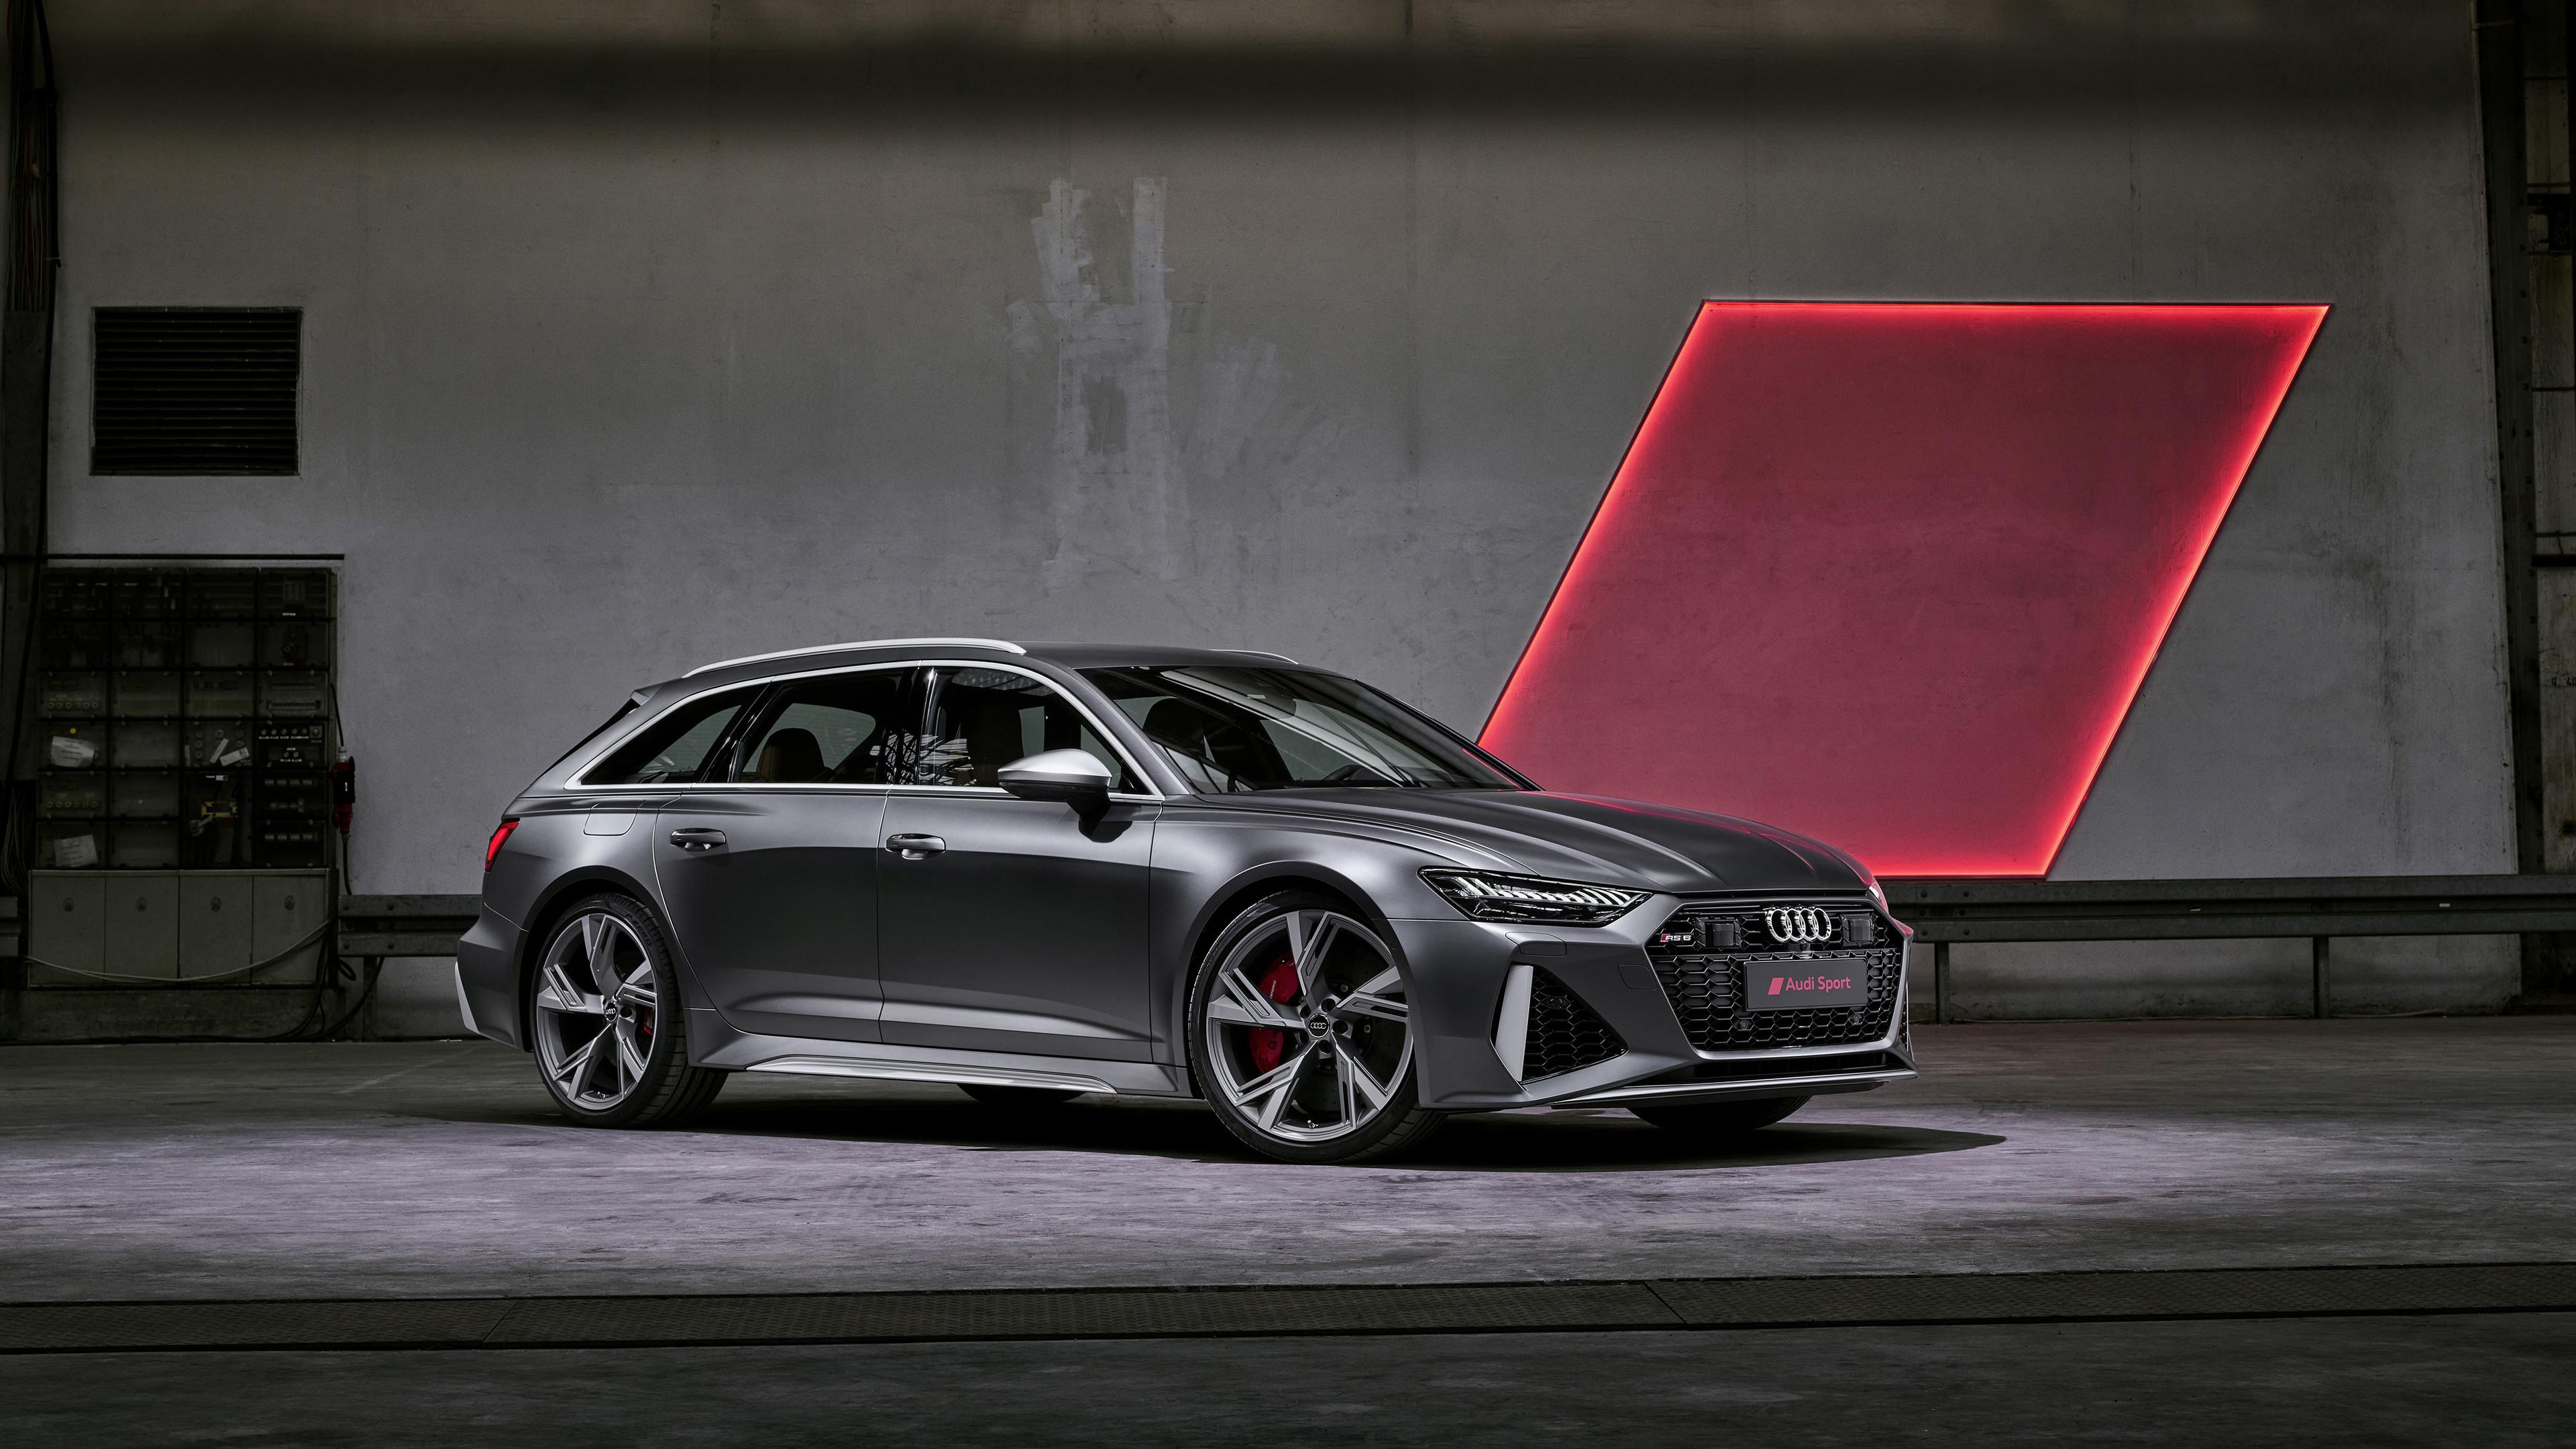 Wallpaper 4k Audi Rs 6 Avant 2019 Front 2019 Cars Wallpapers